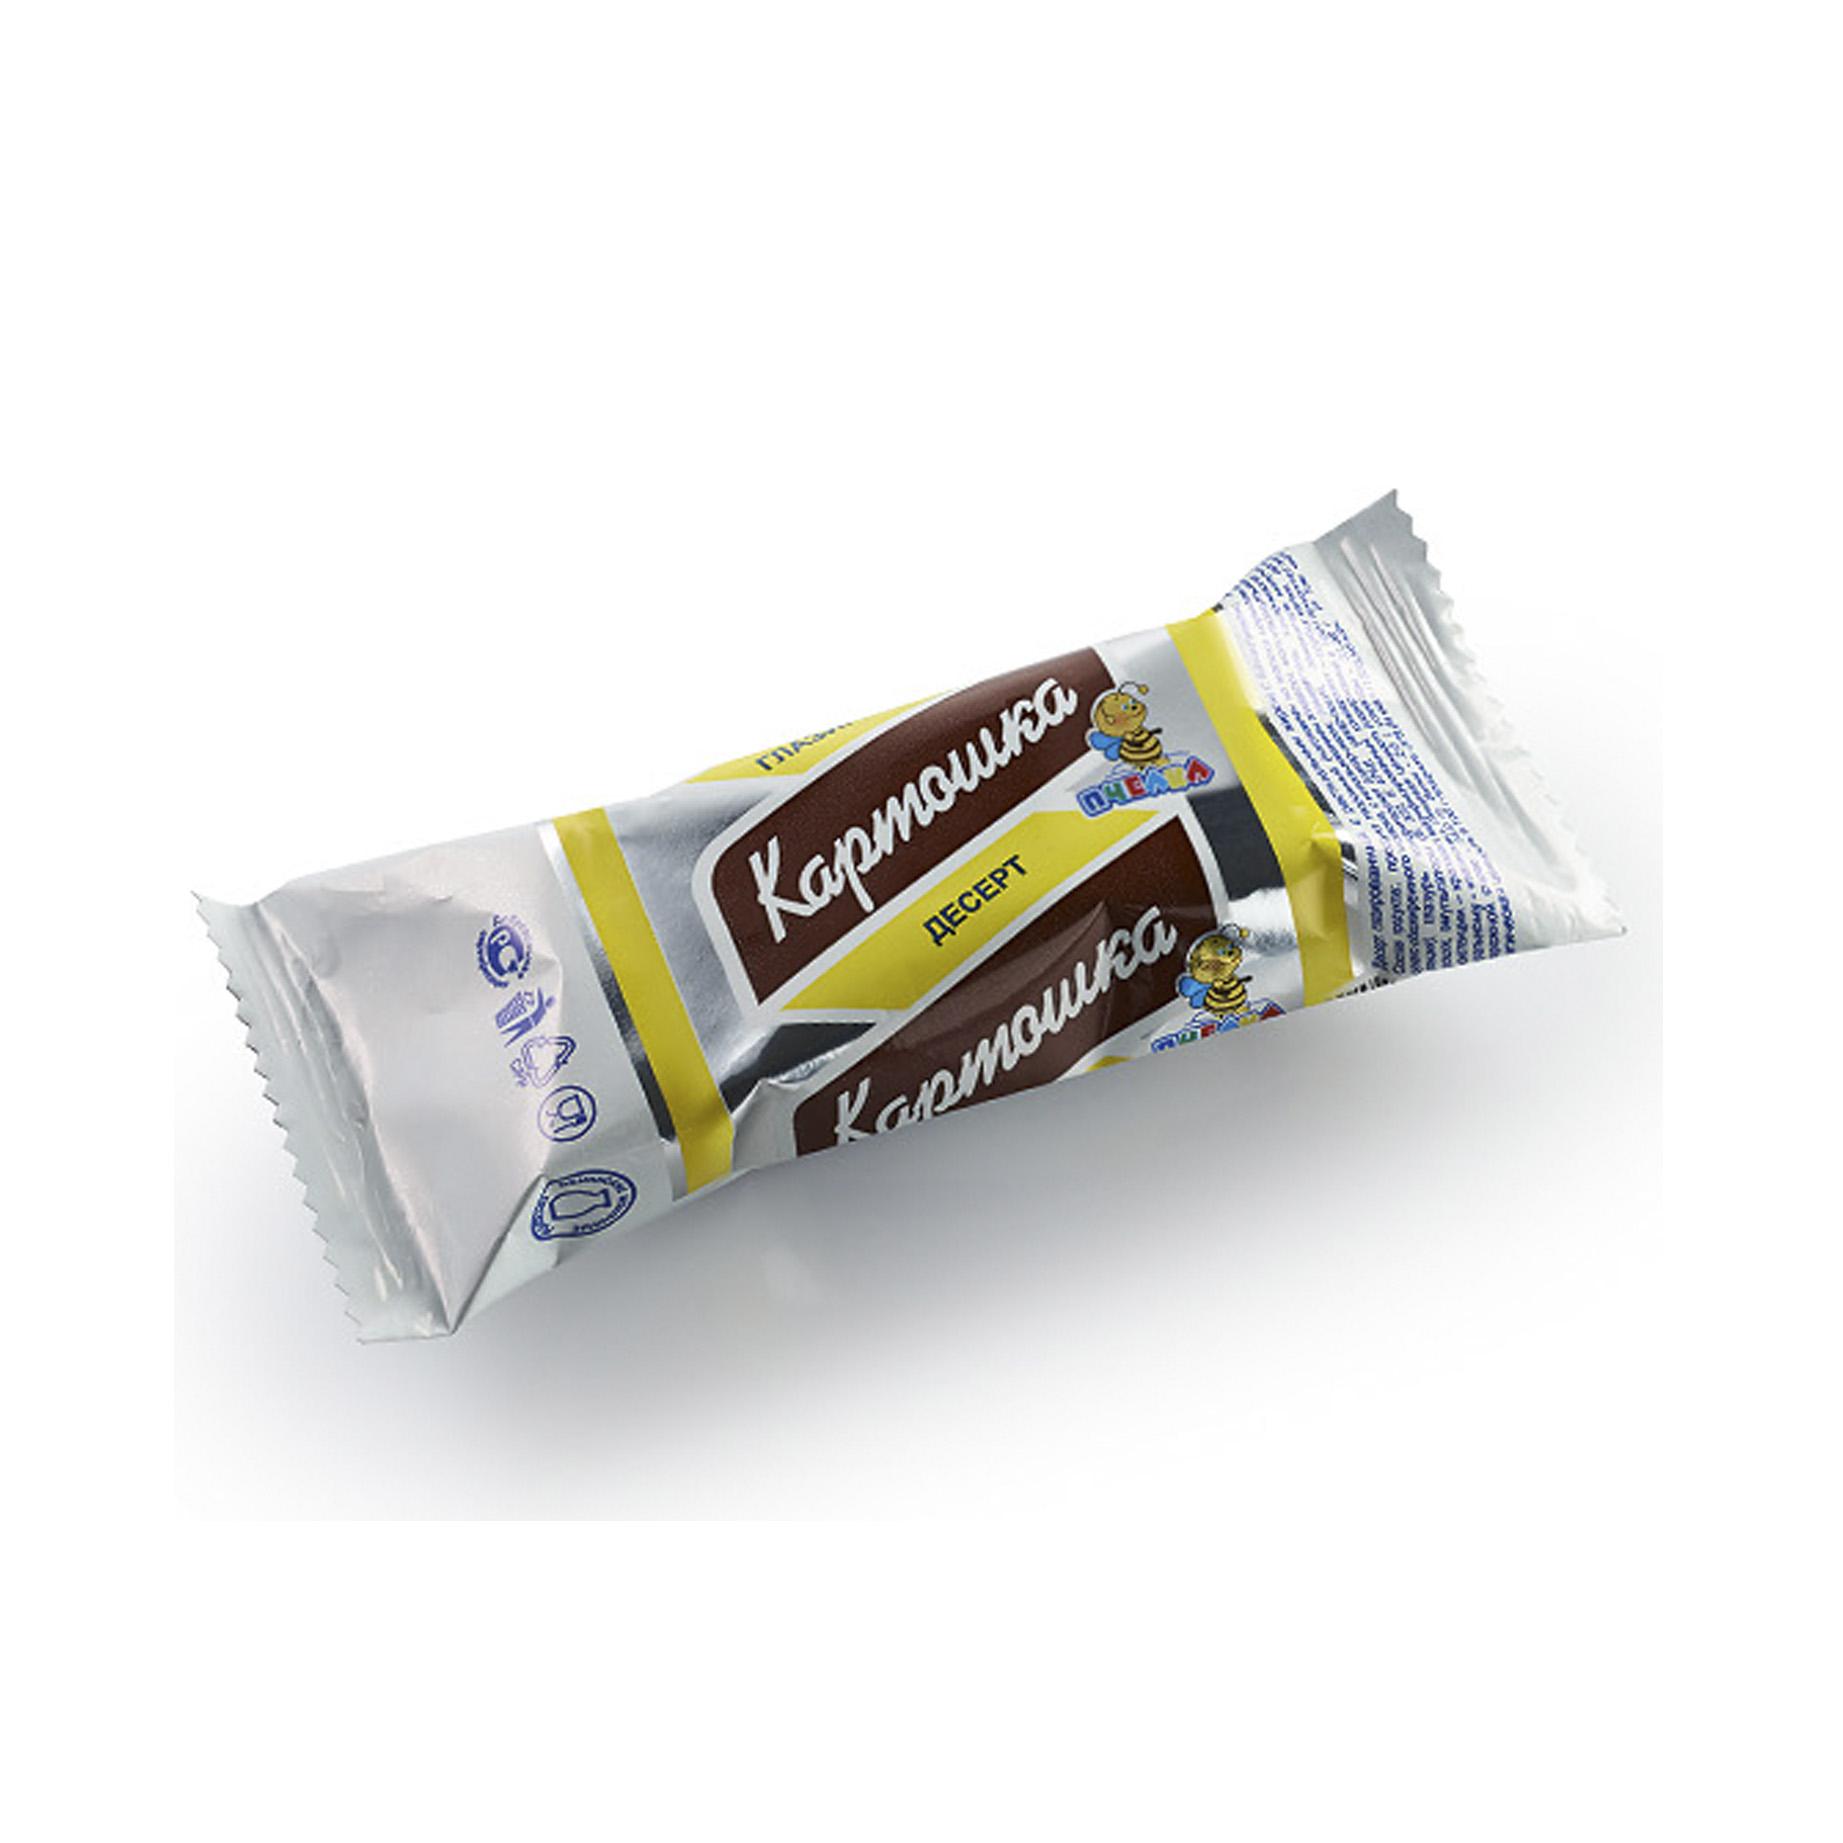 Миниатюра записи Десерт с какао